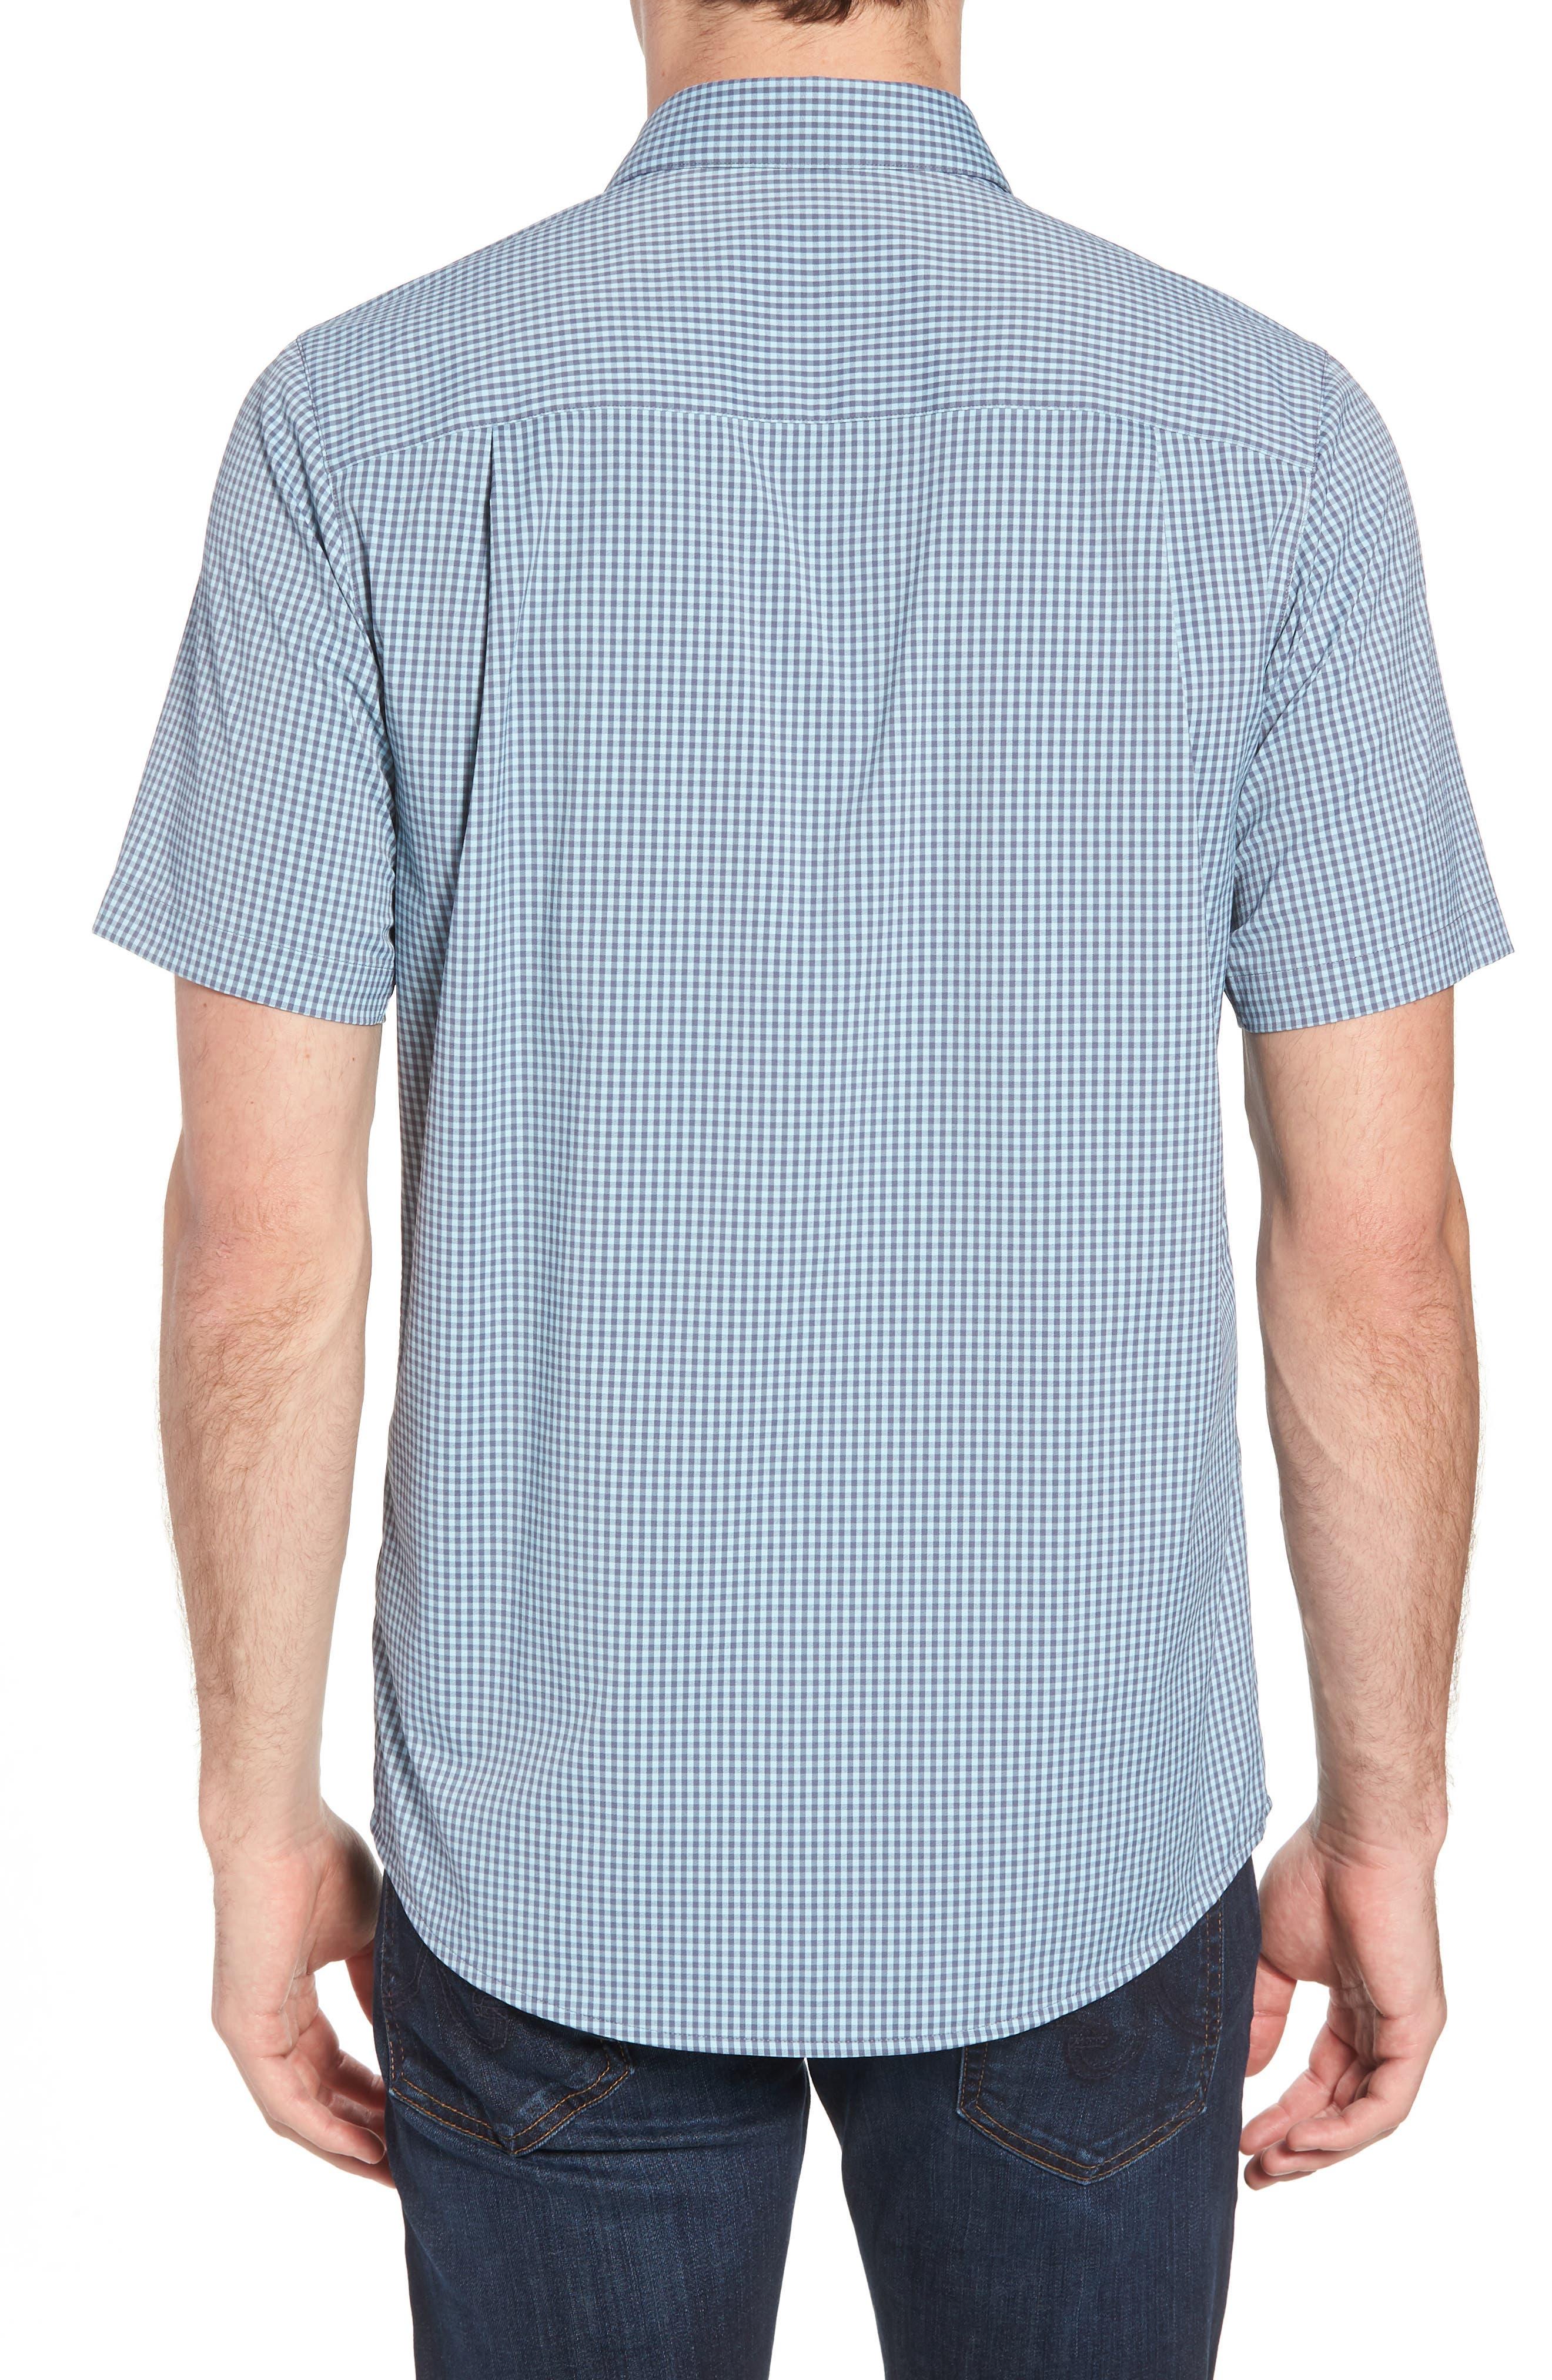 Gygax Regular Fit Sport Shirt,                             Alternate thumbnail 3, color,                             Porcelain Blue